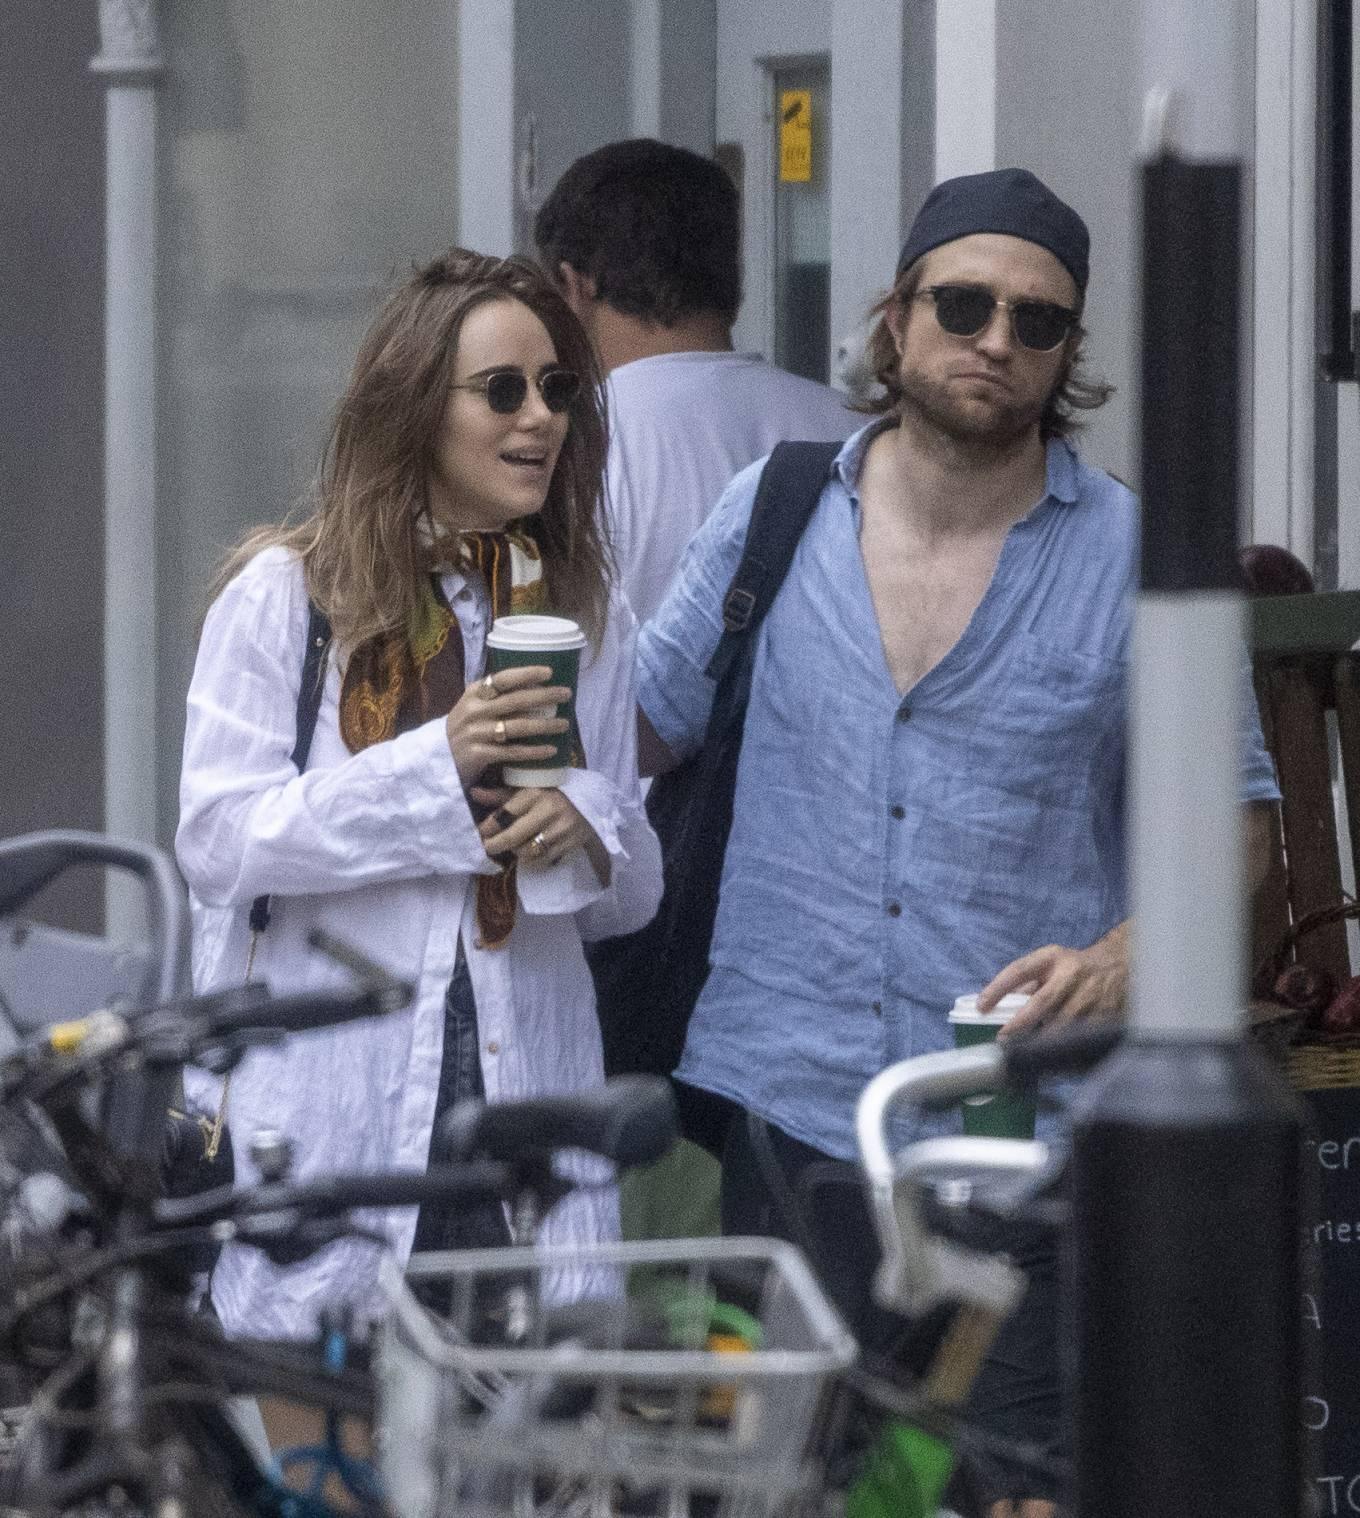 Suki Waterhouse 2020 : Suki Waterhouse and Robert Pattinson – Out in London-17